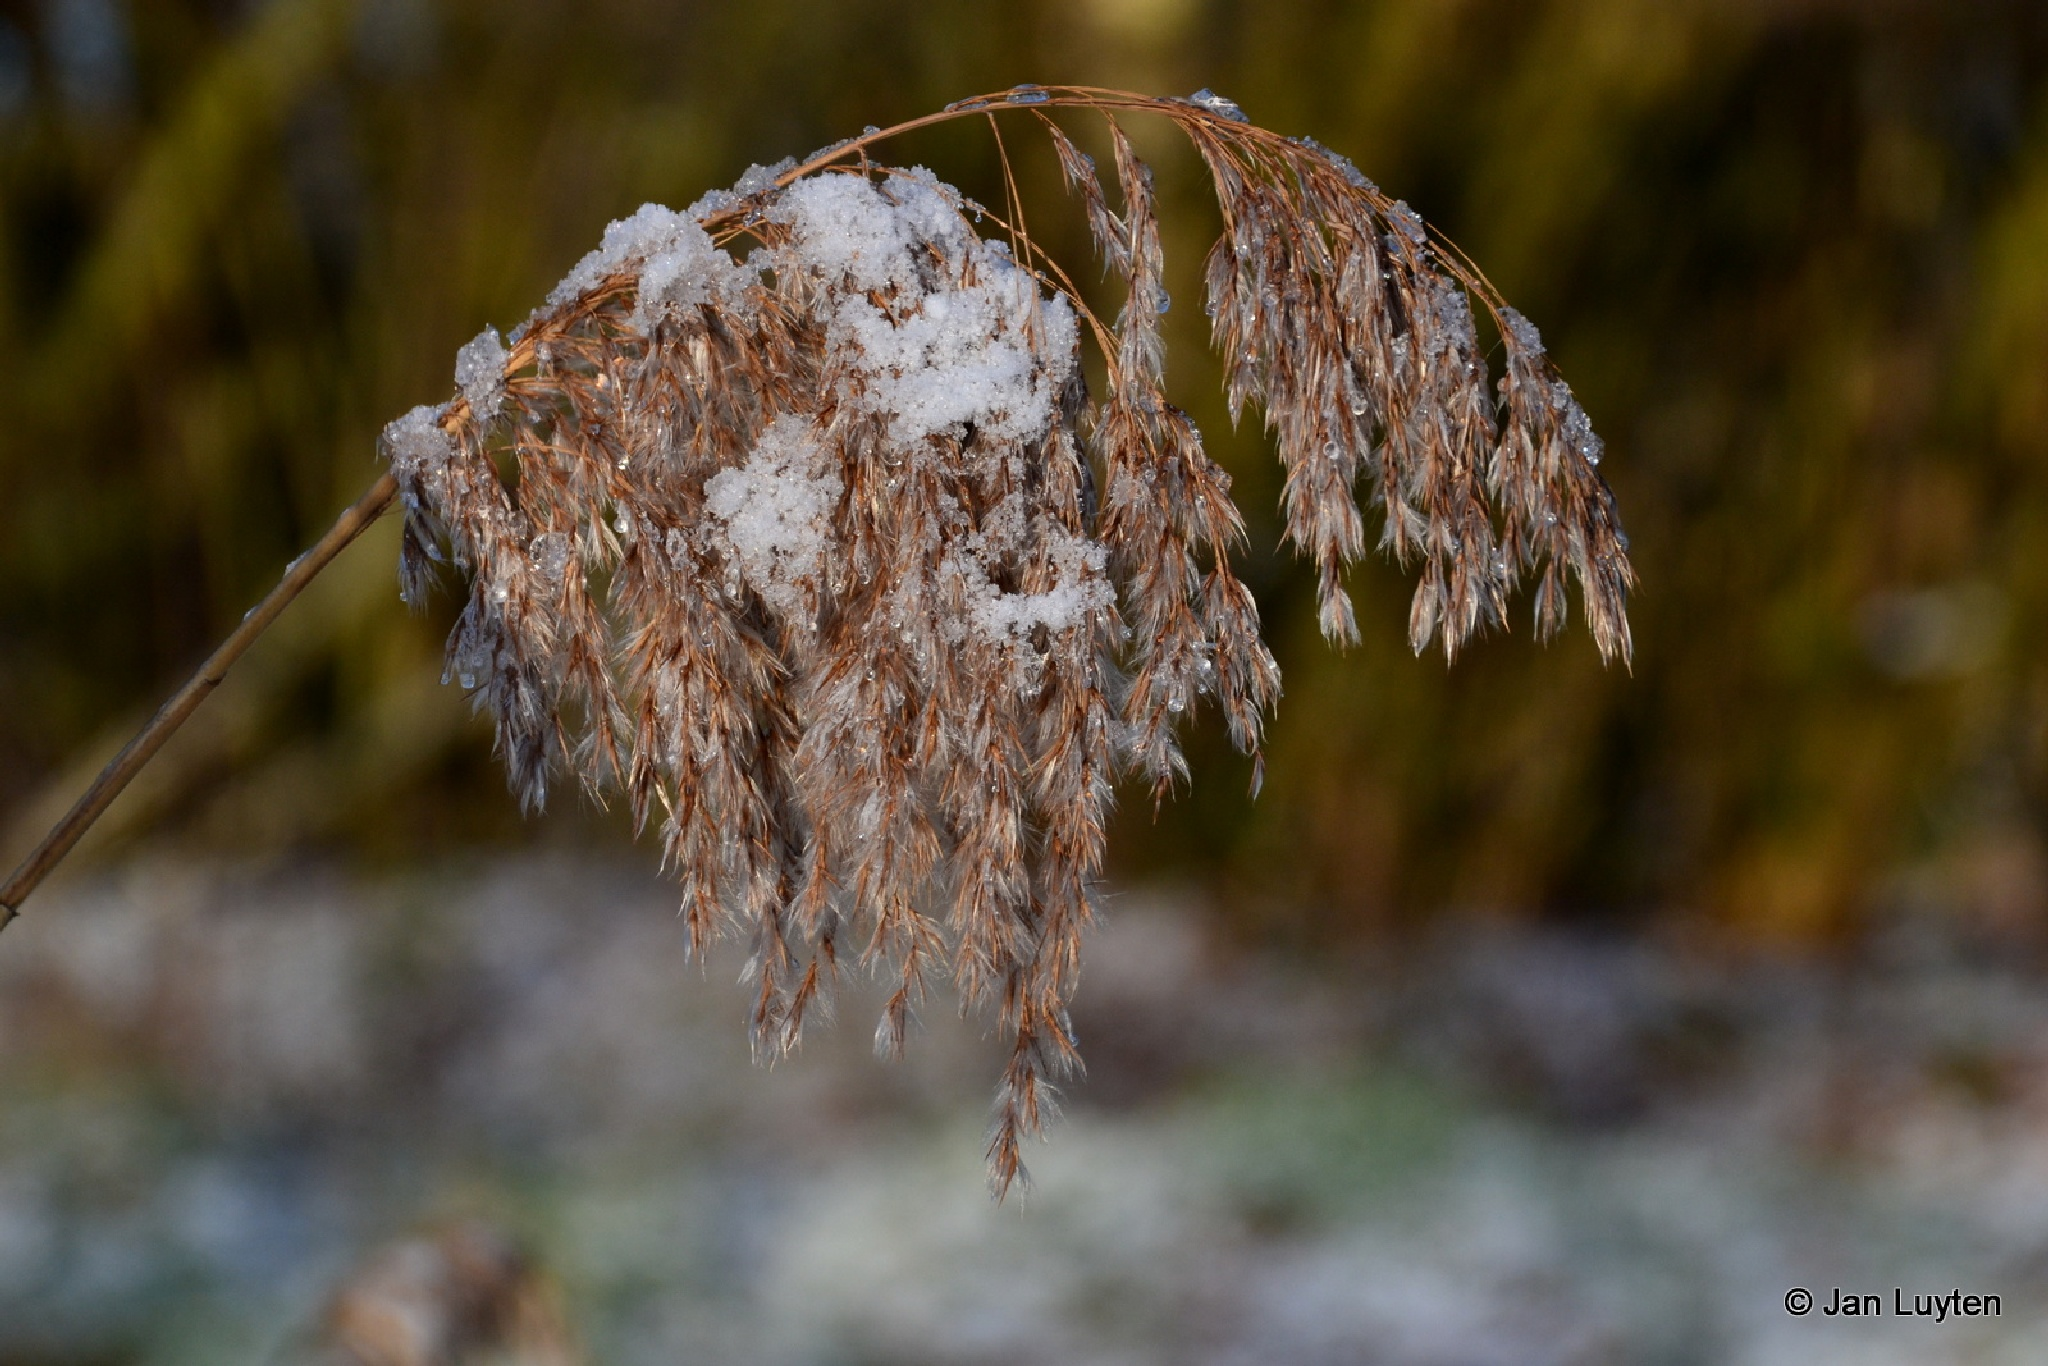 Winterse toestanden by Jan Luyten